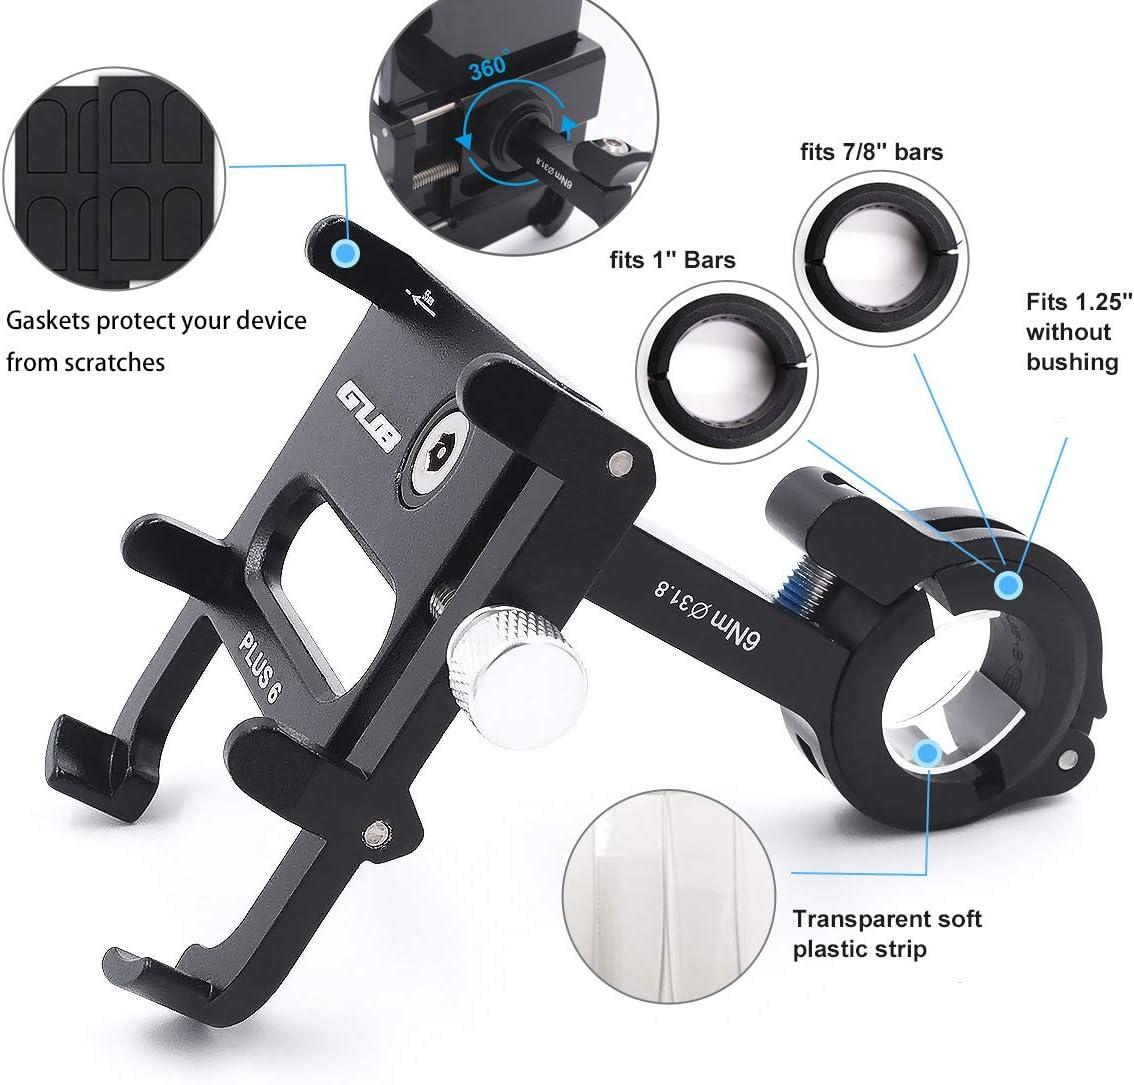 GUB Bicycle and motorcycle phone mount